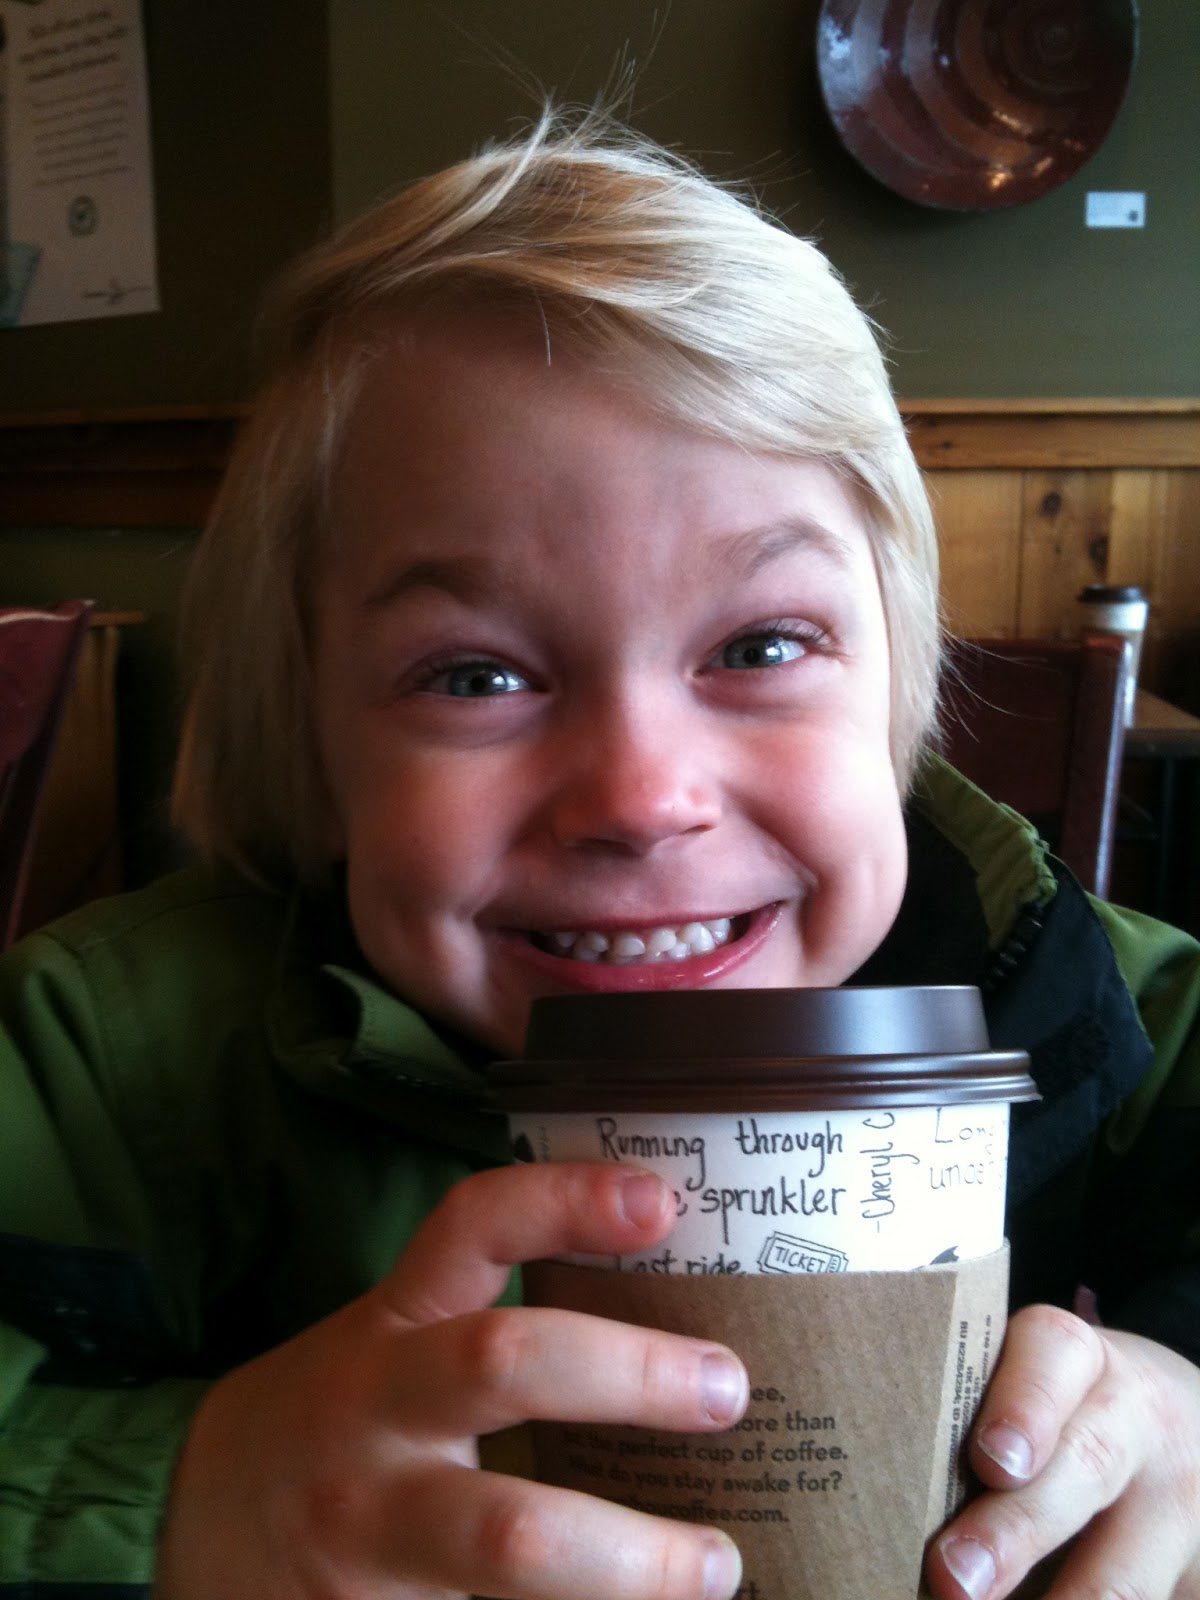 Drinking Coffee With Benadryl